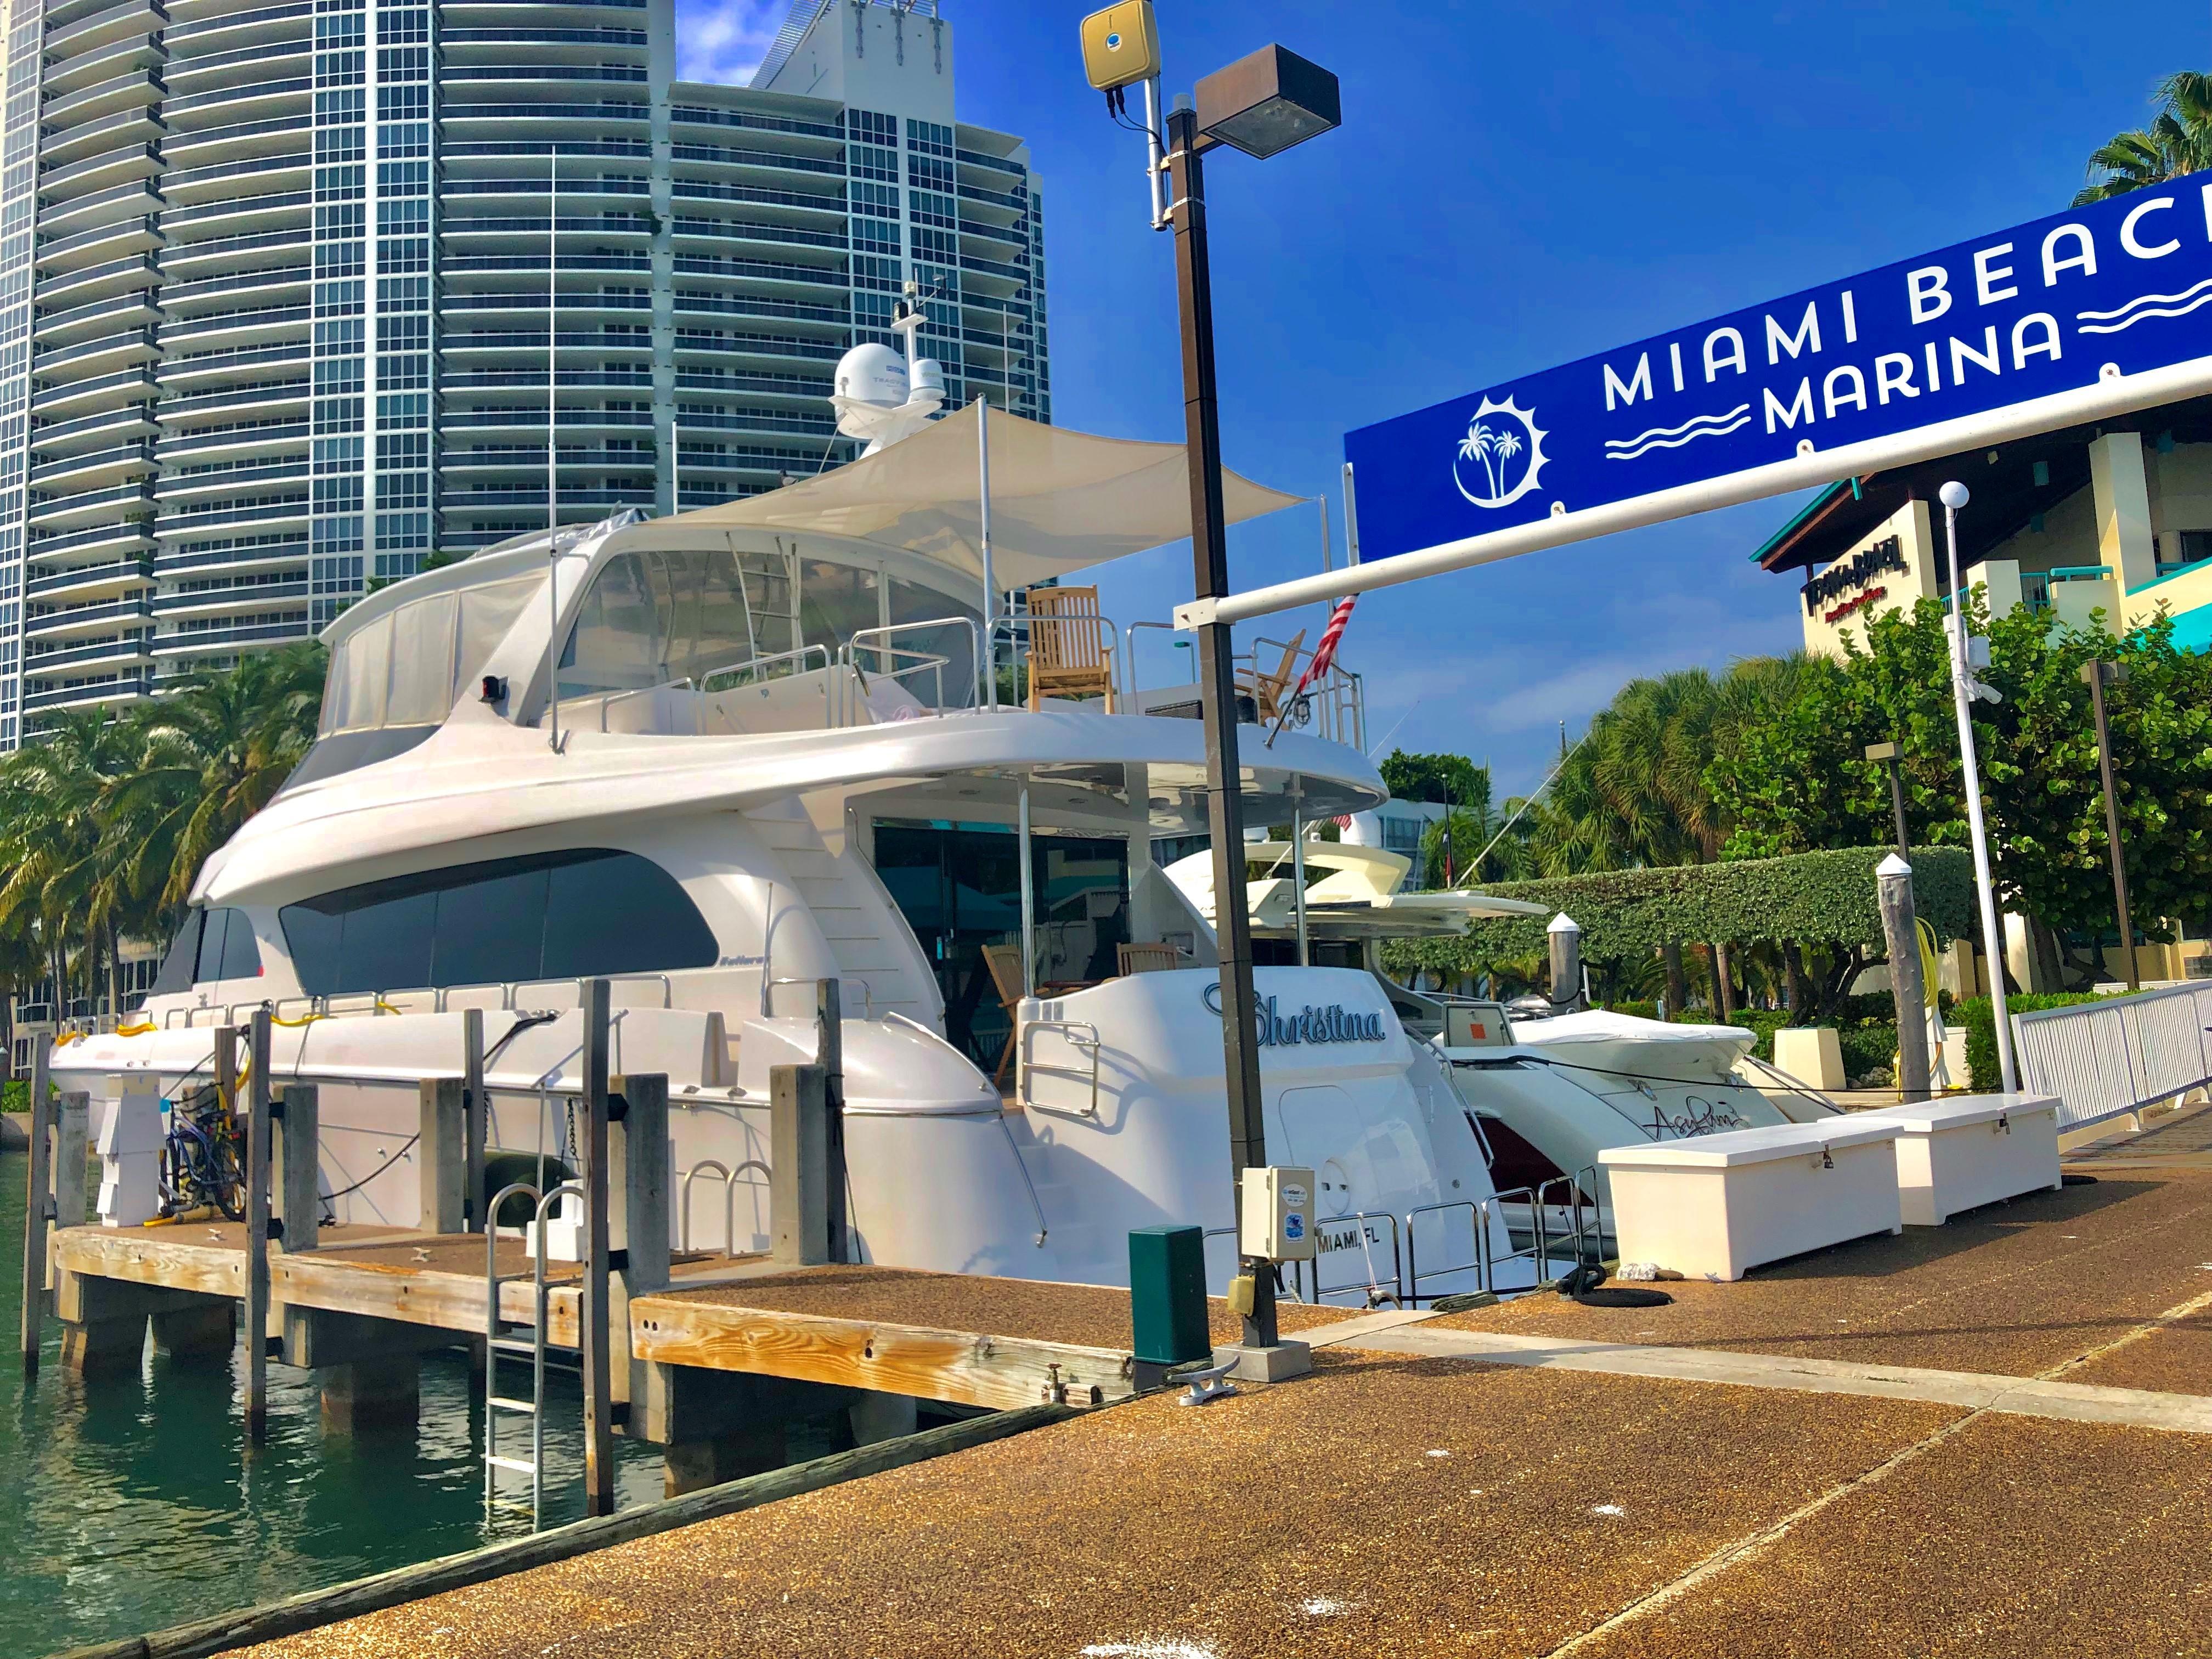 Christina of Miami Beach